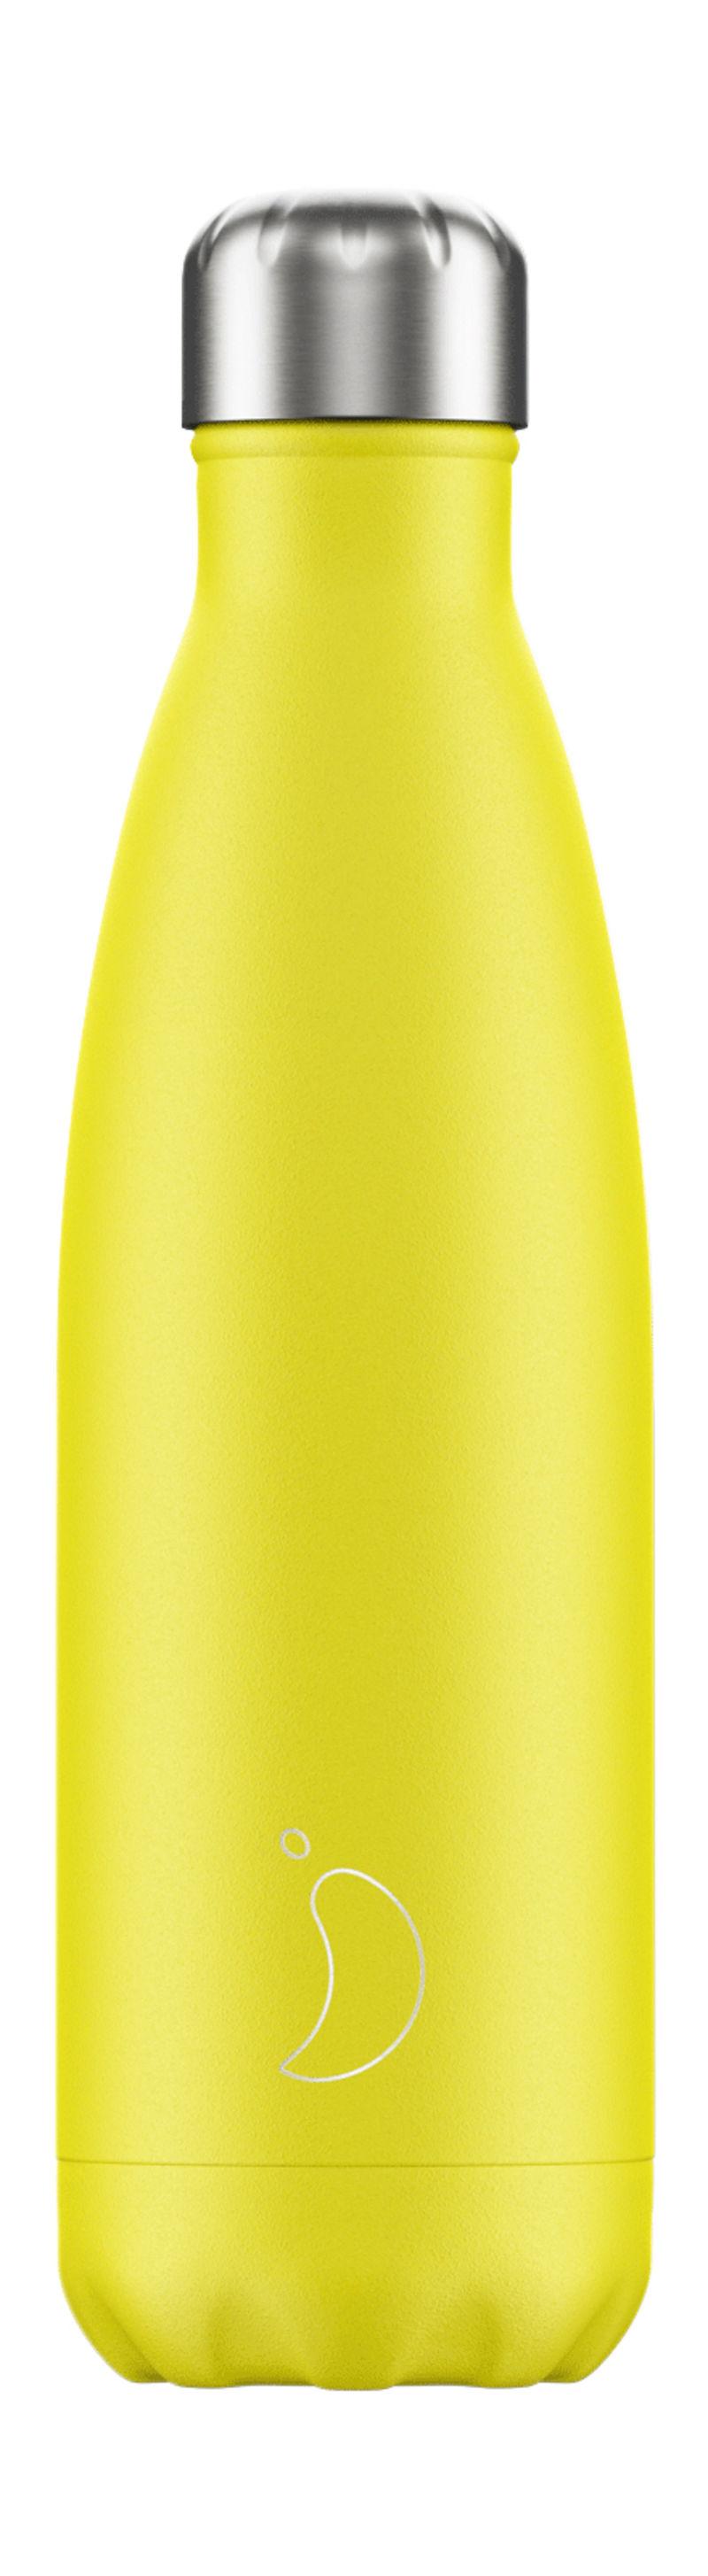 BOTELLA INOX AMARILLO NEON 500ML